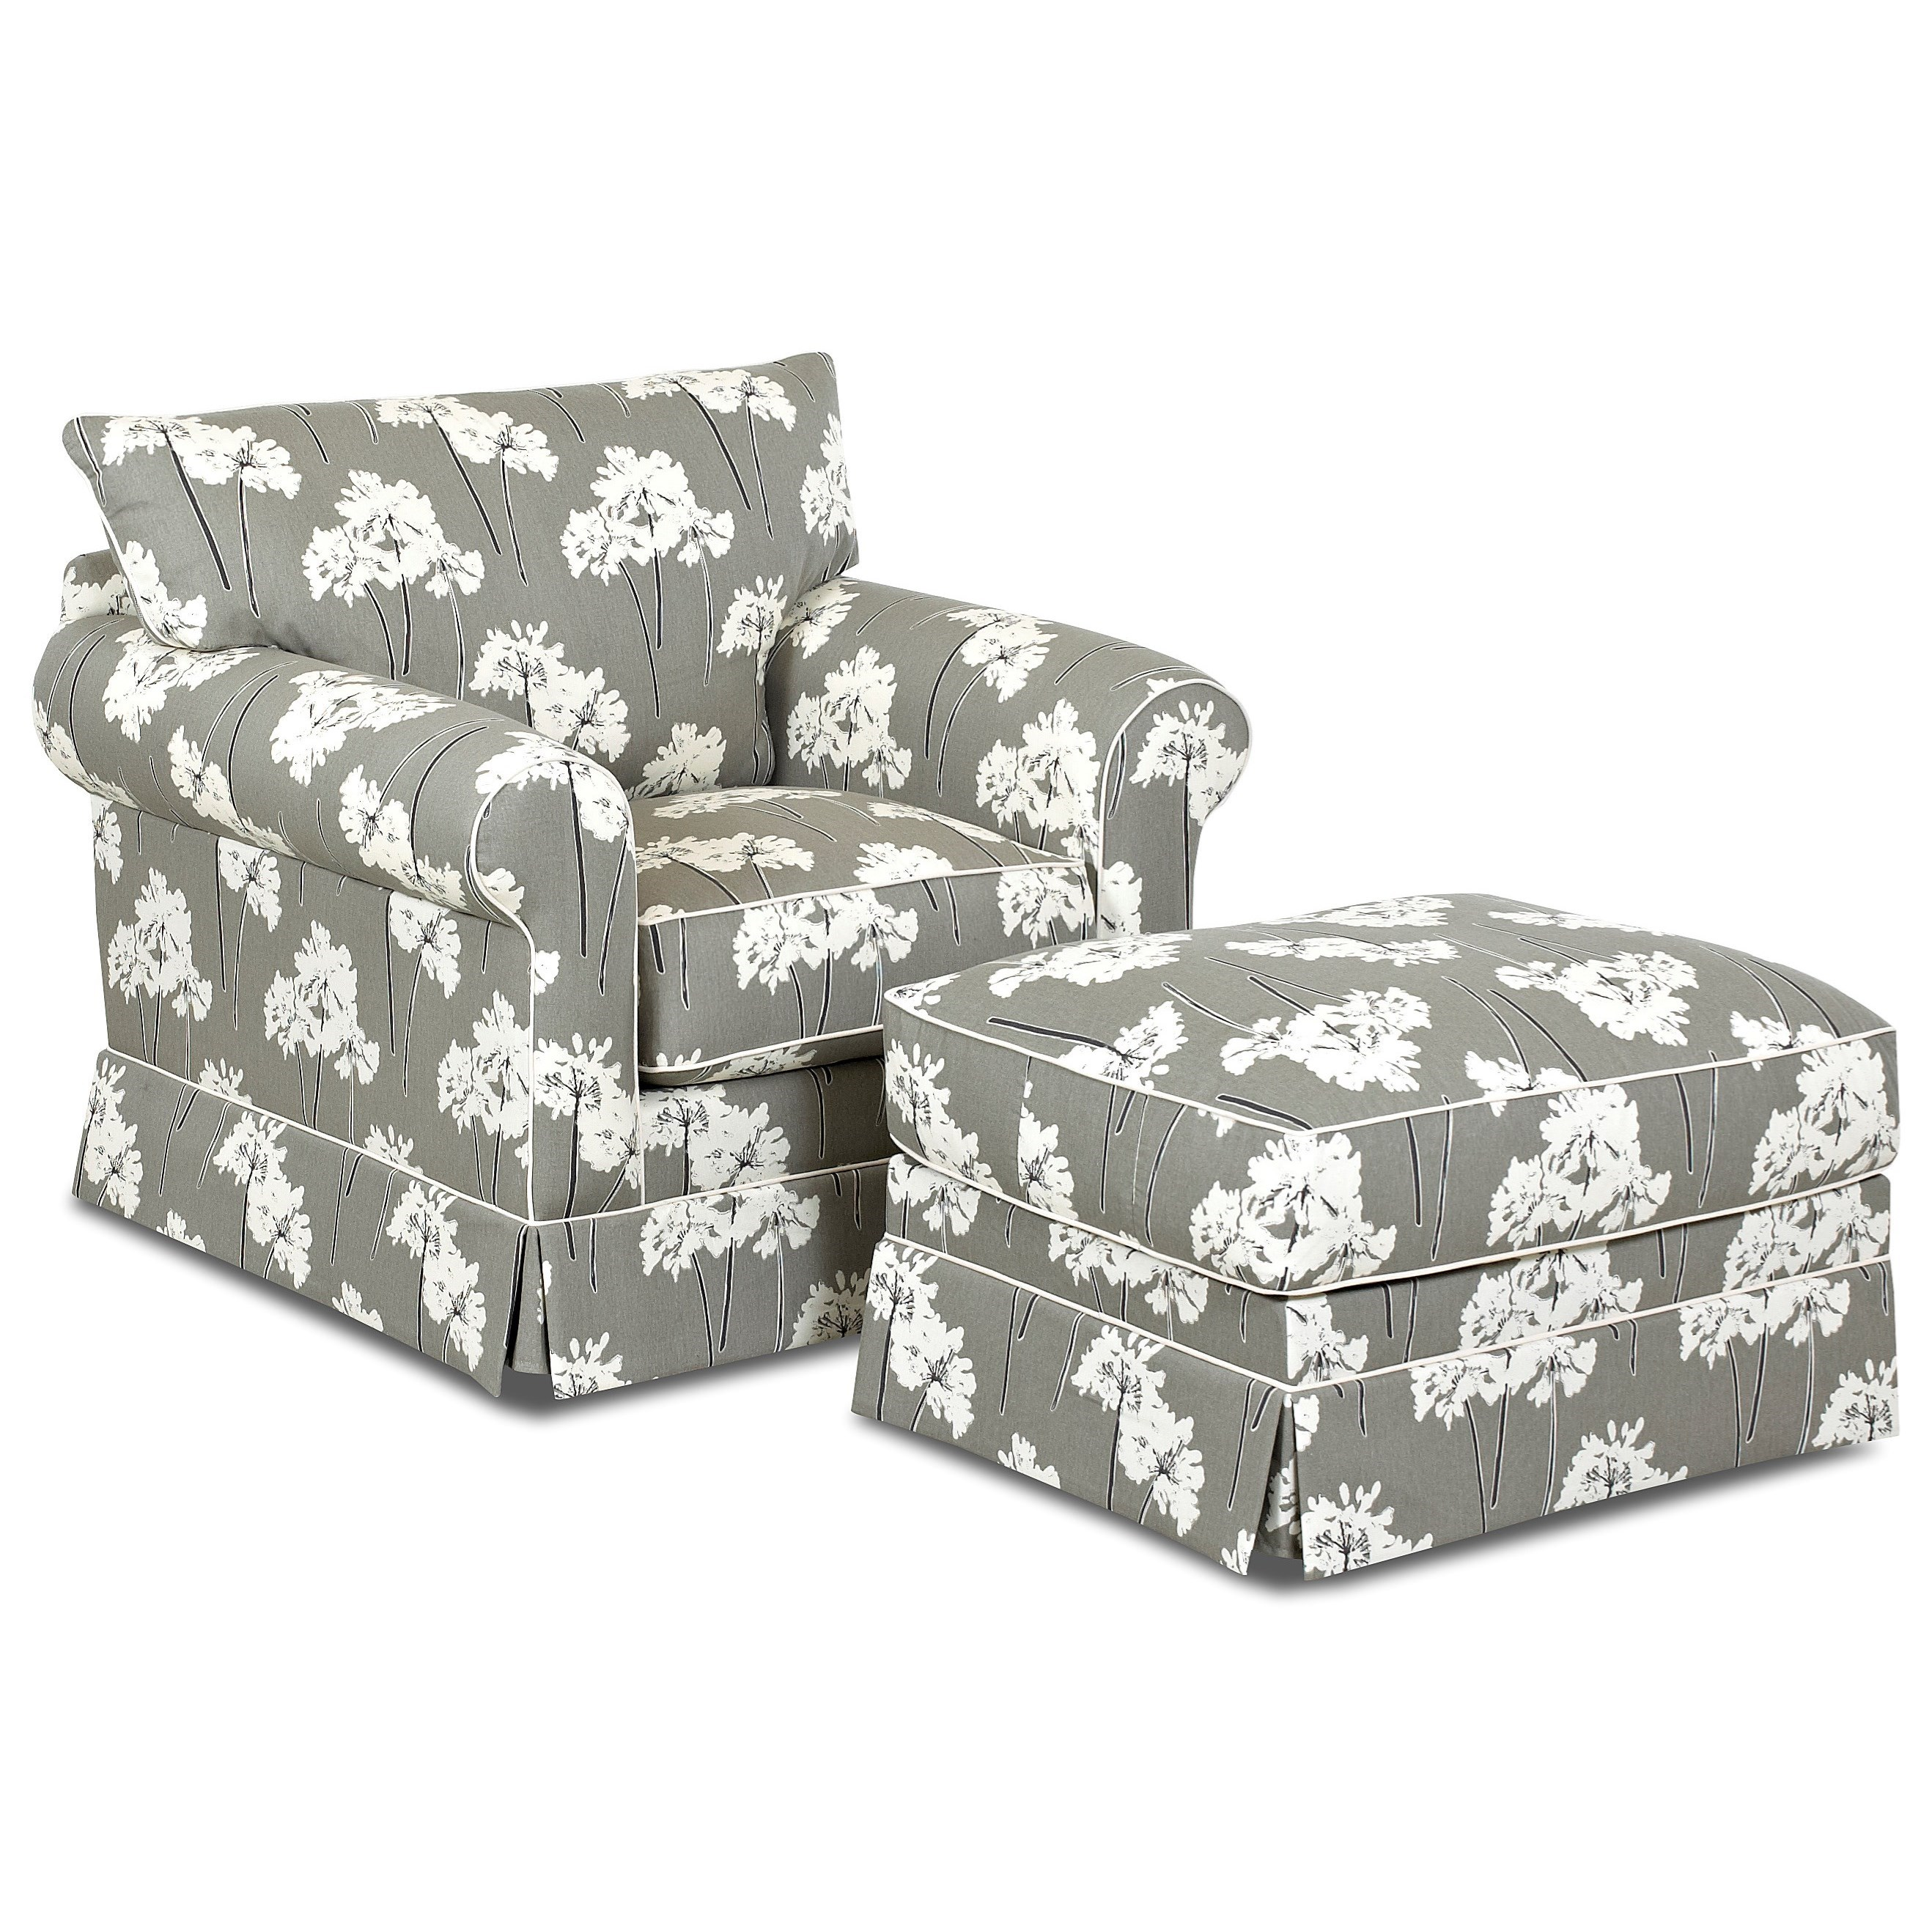 Klaussner Jenny Chair & Ottoman Set - Item Number: D16700 C+D16700 OTTO-Serina storm